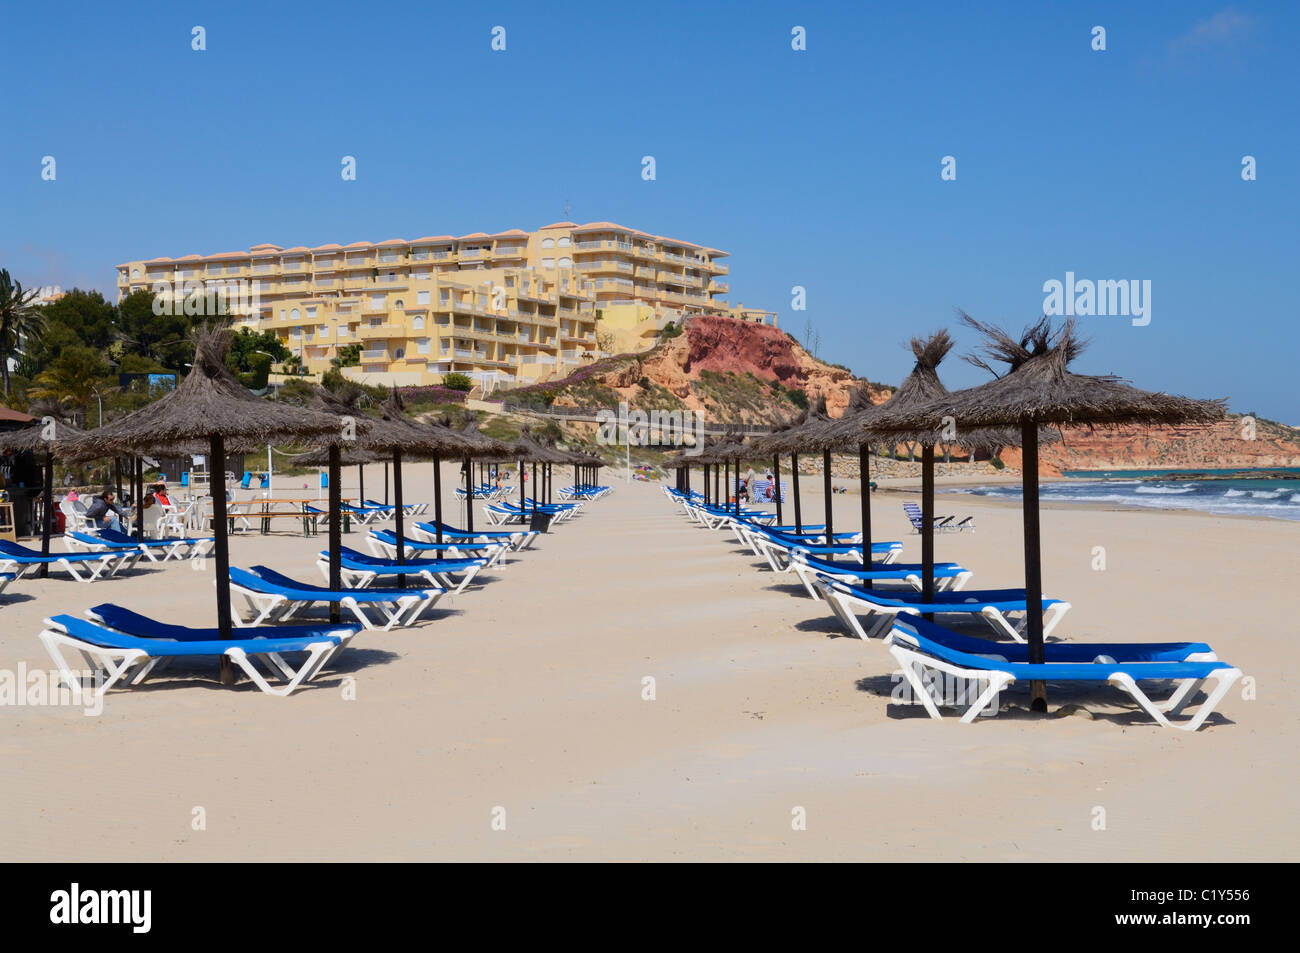 Campoamor beach at dehesa de campoamor orihuela alicante - Stock uno alicante ...